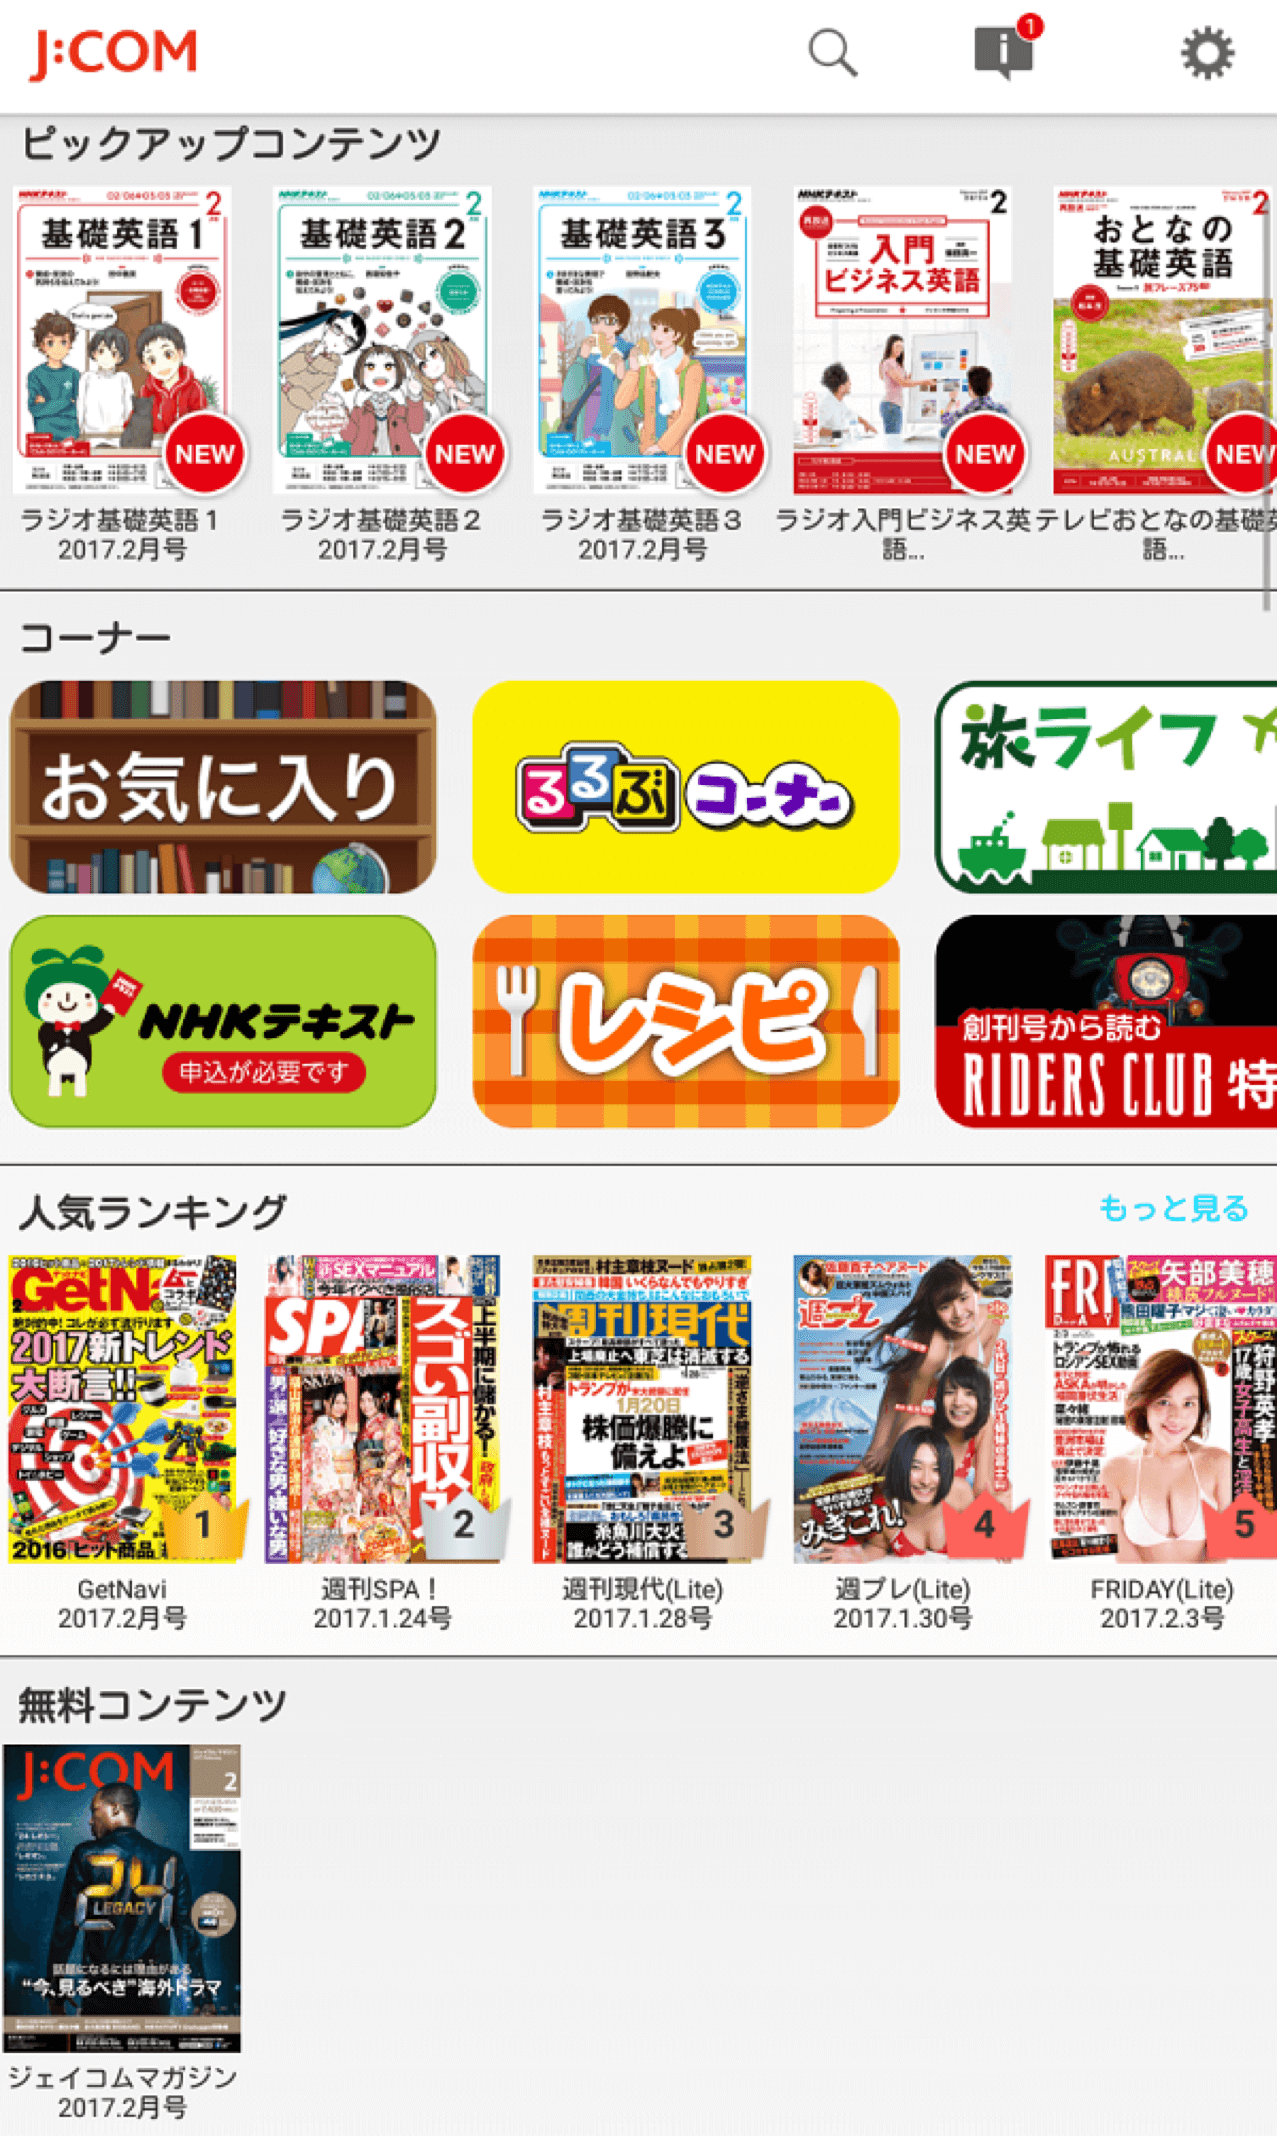 J:COMブックス アプリトップ画面